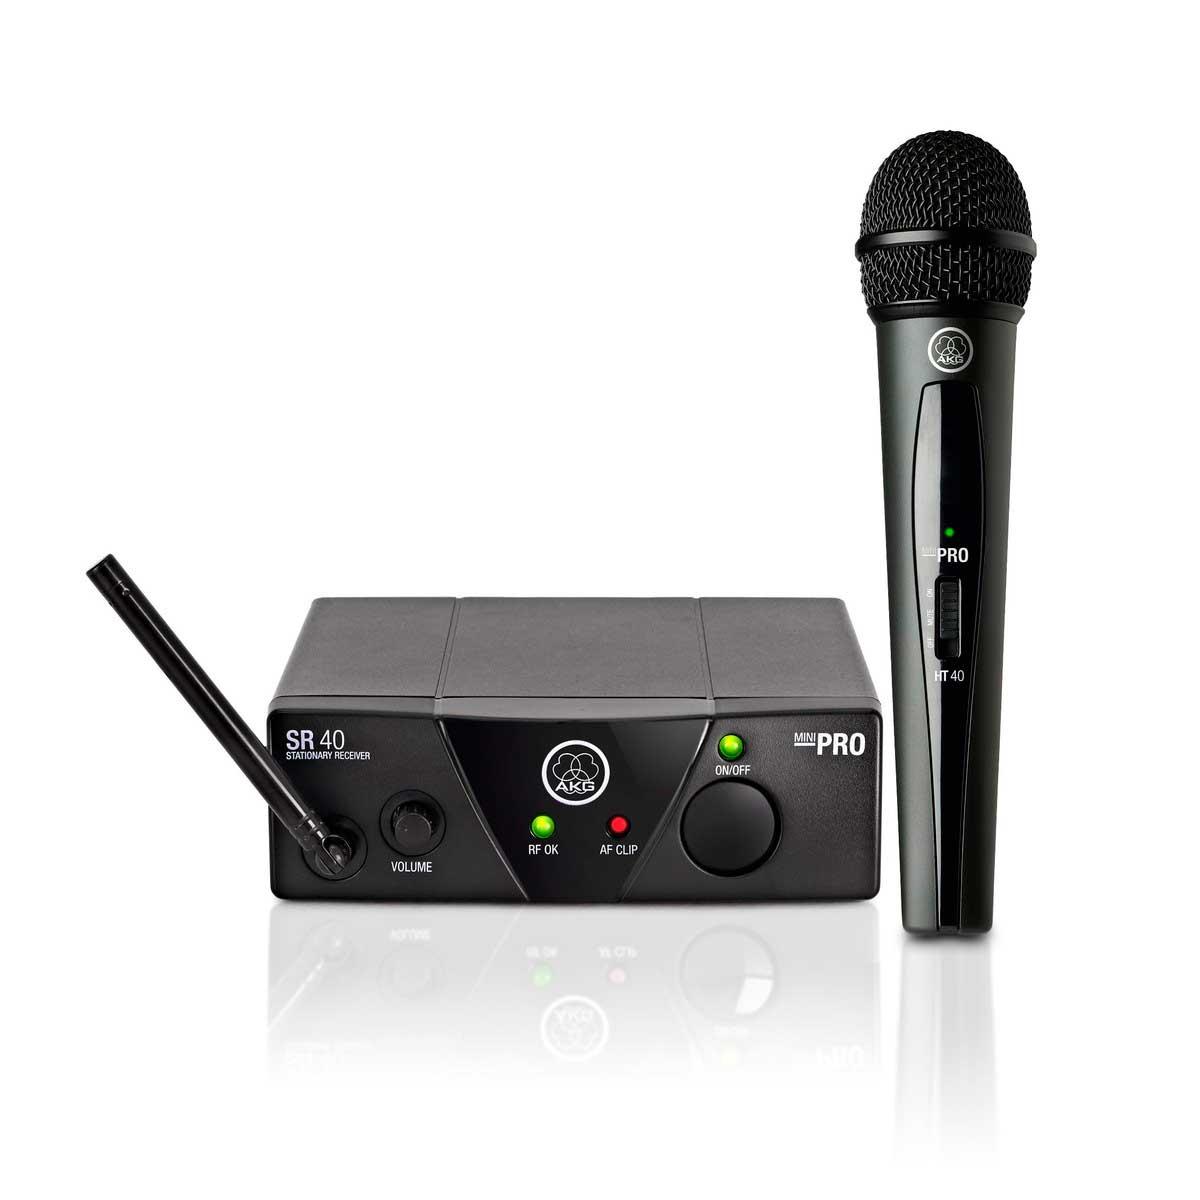 Sistema de microfone sem fio, cardioide e frequência US25C 539.300 MHz | WMS40 Mini Vocal Set | AKG